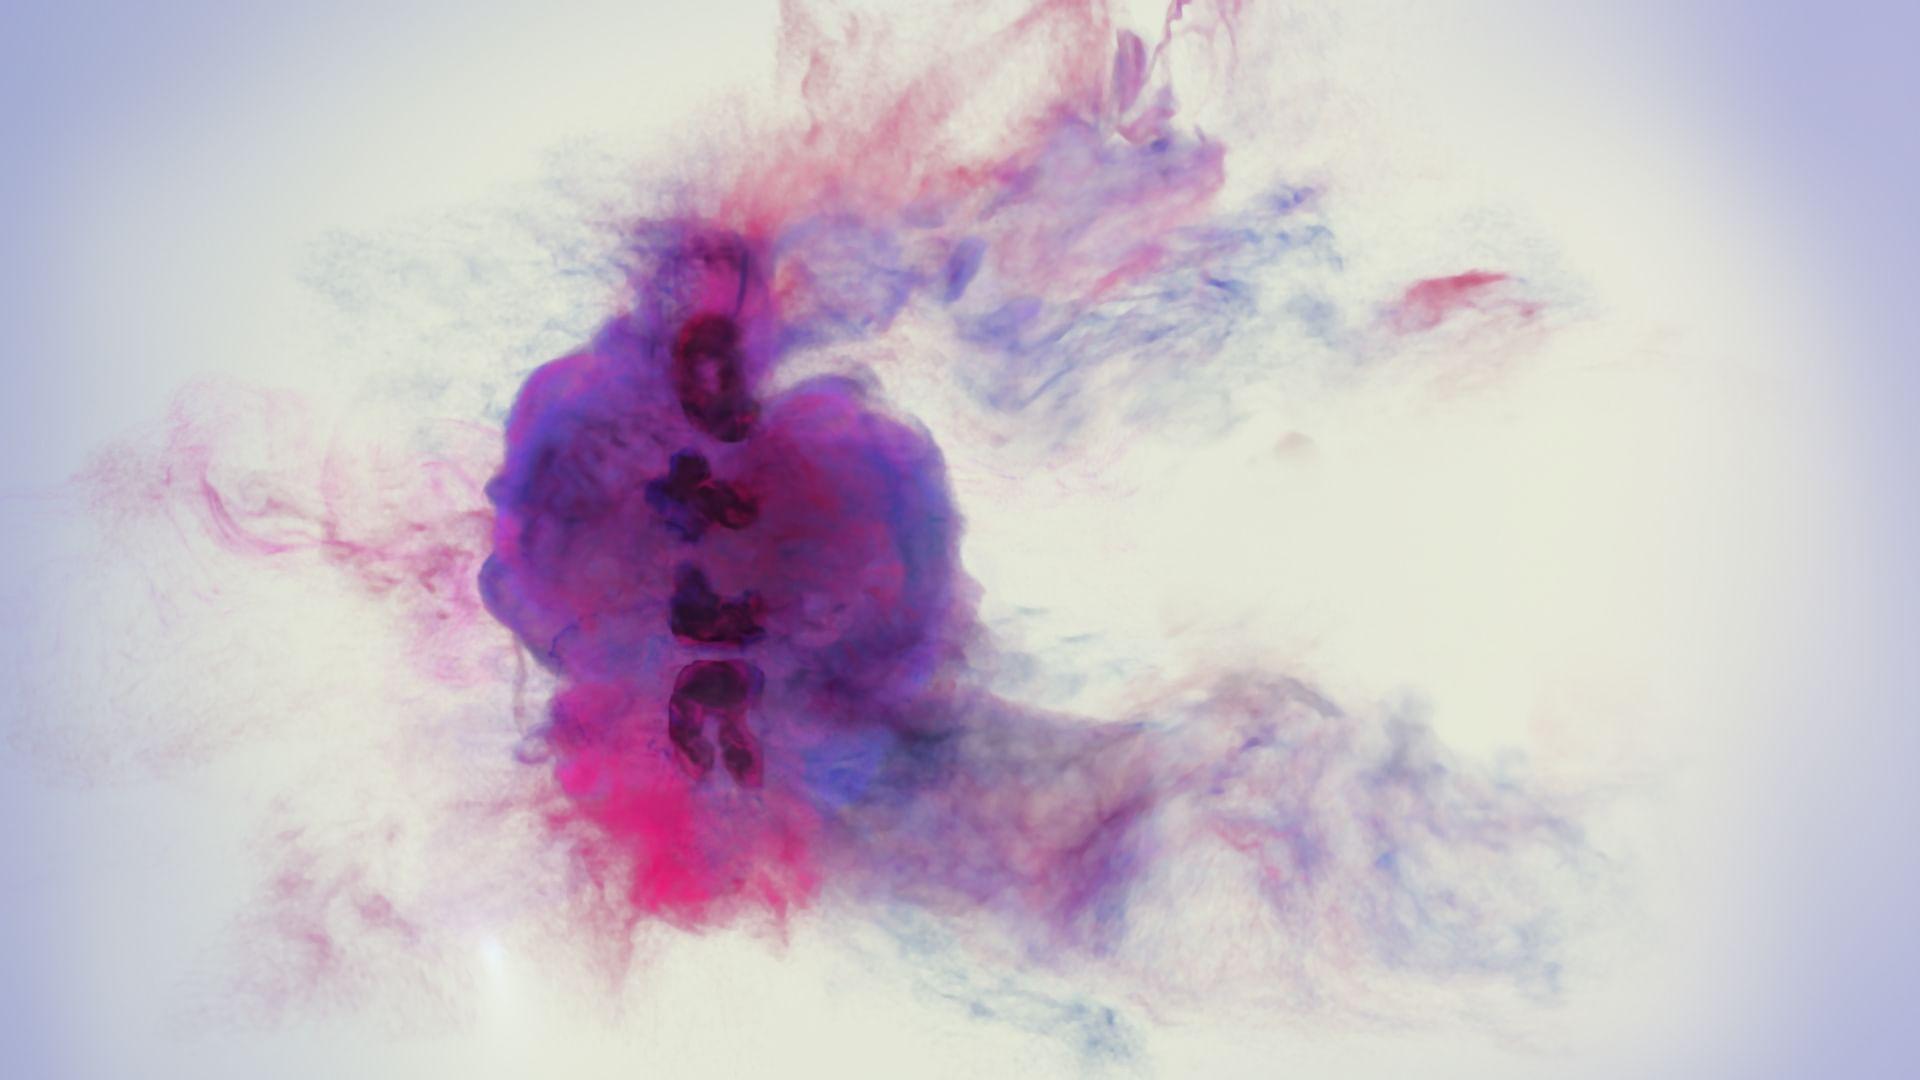 Street Photography - Janette Beckman. Hip hop & Gang culture